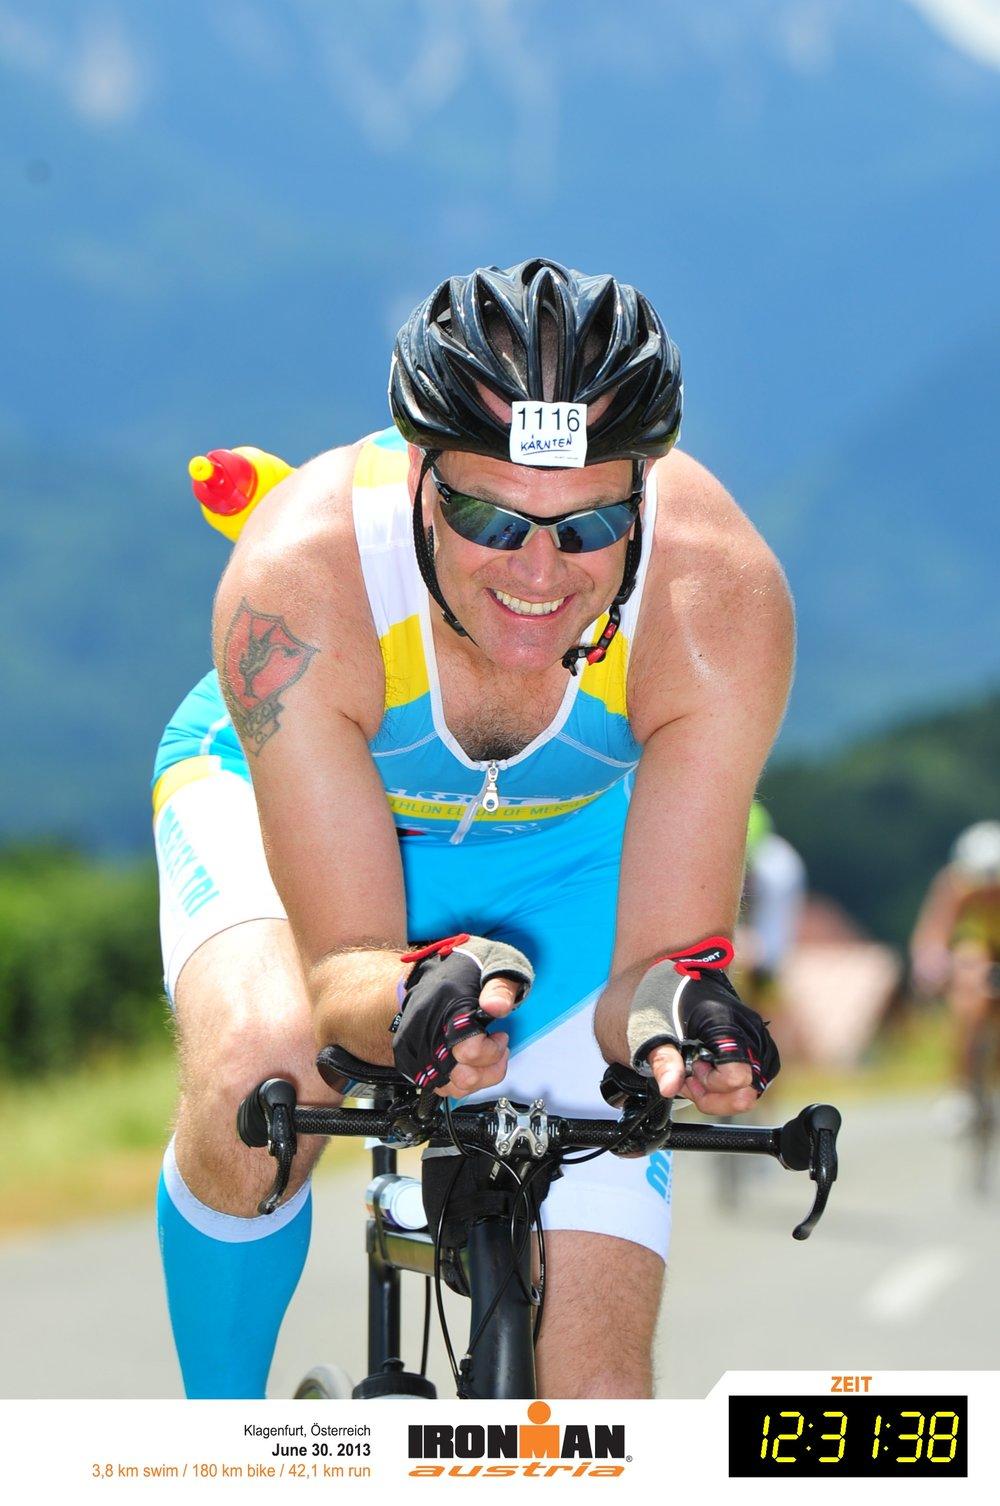 Eddie Berry  Ironman Wales 2016 - 14:25:00  Ironman Lanzarote 2014 - 12:51:30  Ironman Sweden 2014 - 11:15:55  Ironman Austria 2013 - 12:31:39